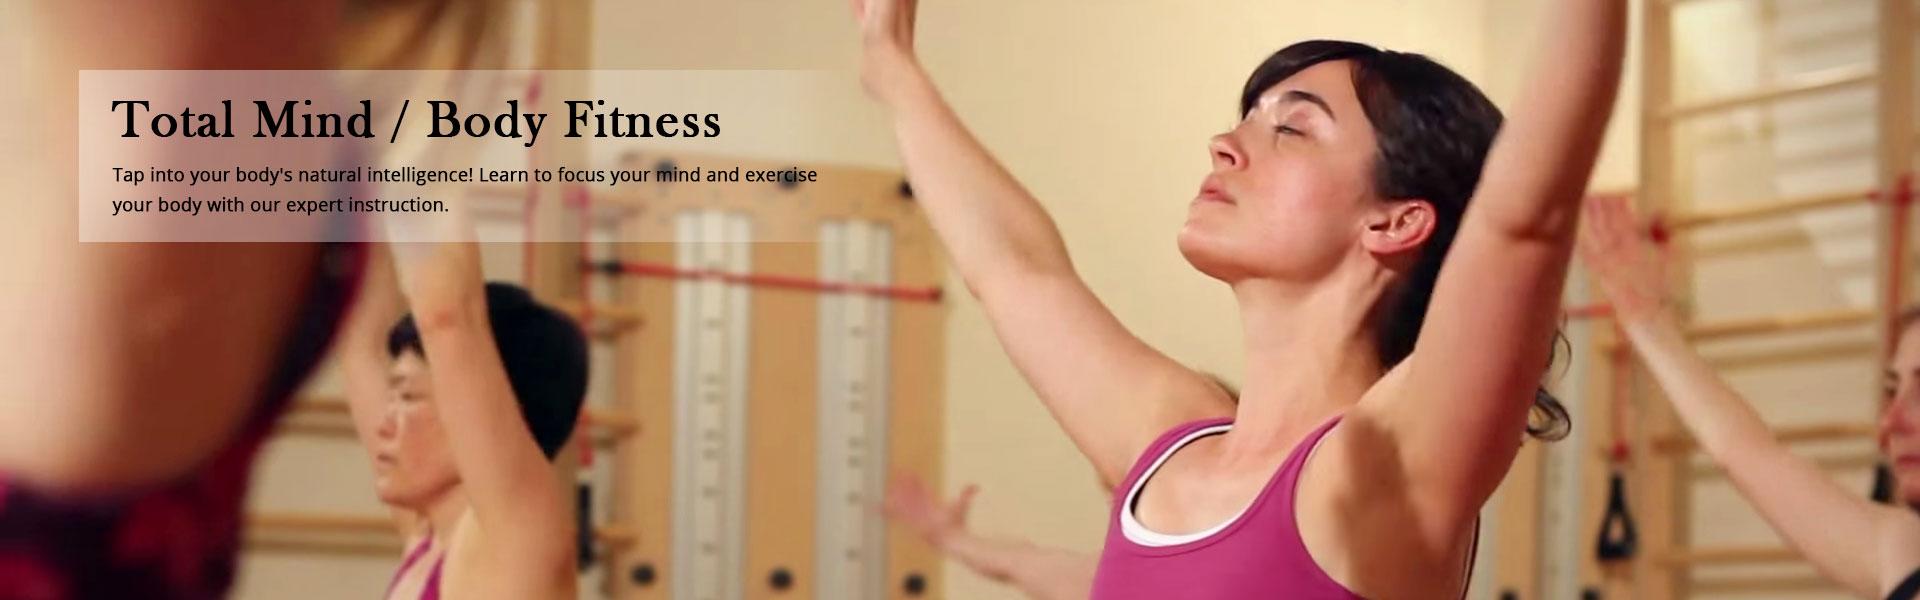 total_mindbody_fitness